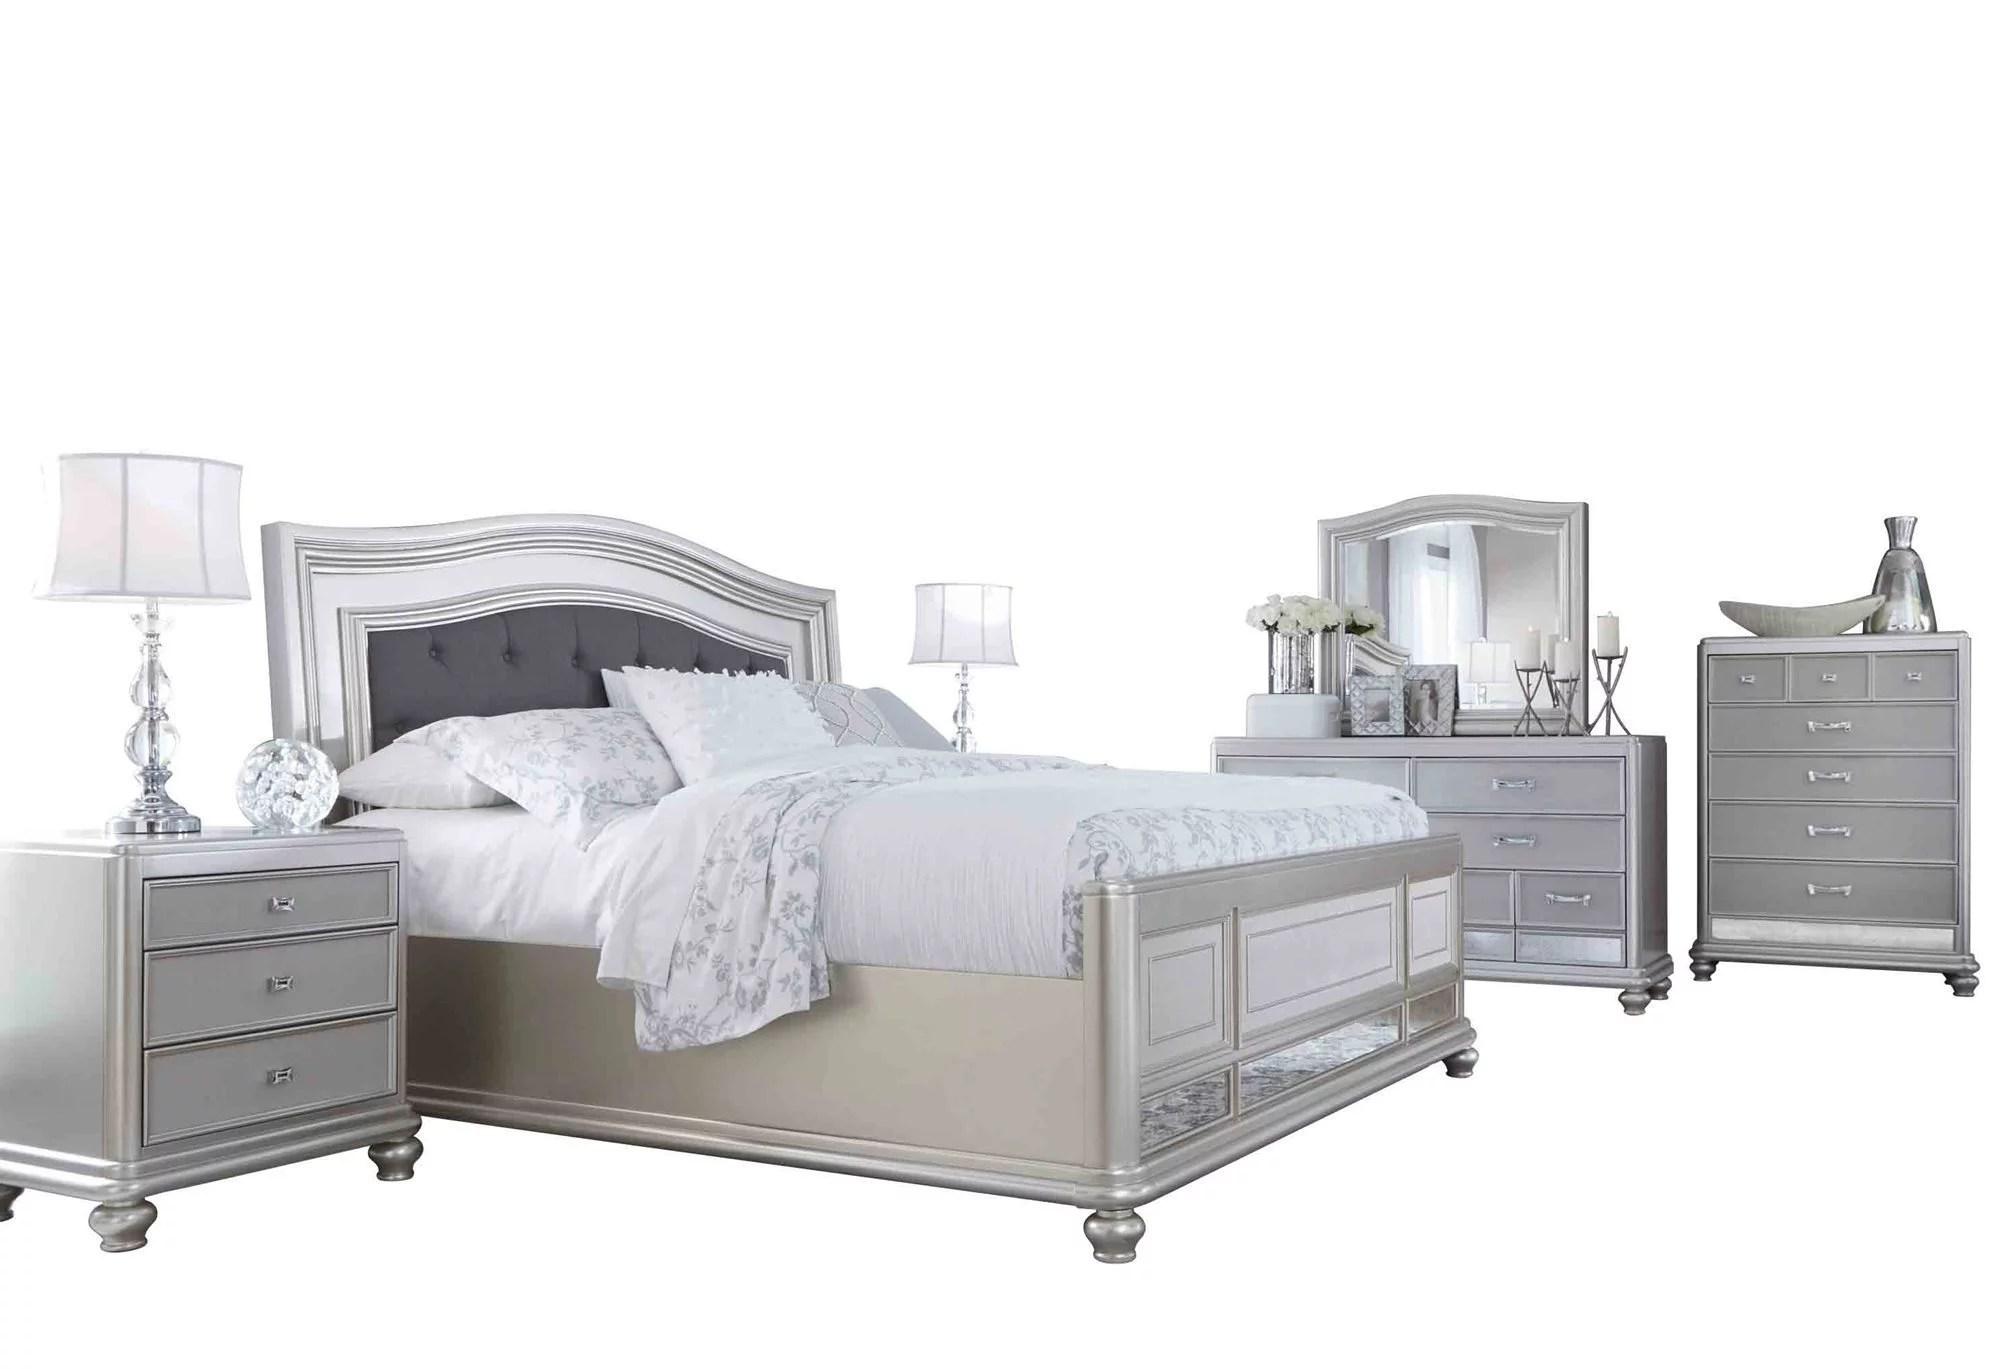 Ashley Furniture Coralayne 6 Pc Bedroom Set Queen Upholstered Bed 2 Nightstand Dresser Mirror Chest Silver Walmart Com Walmart Com